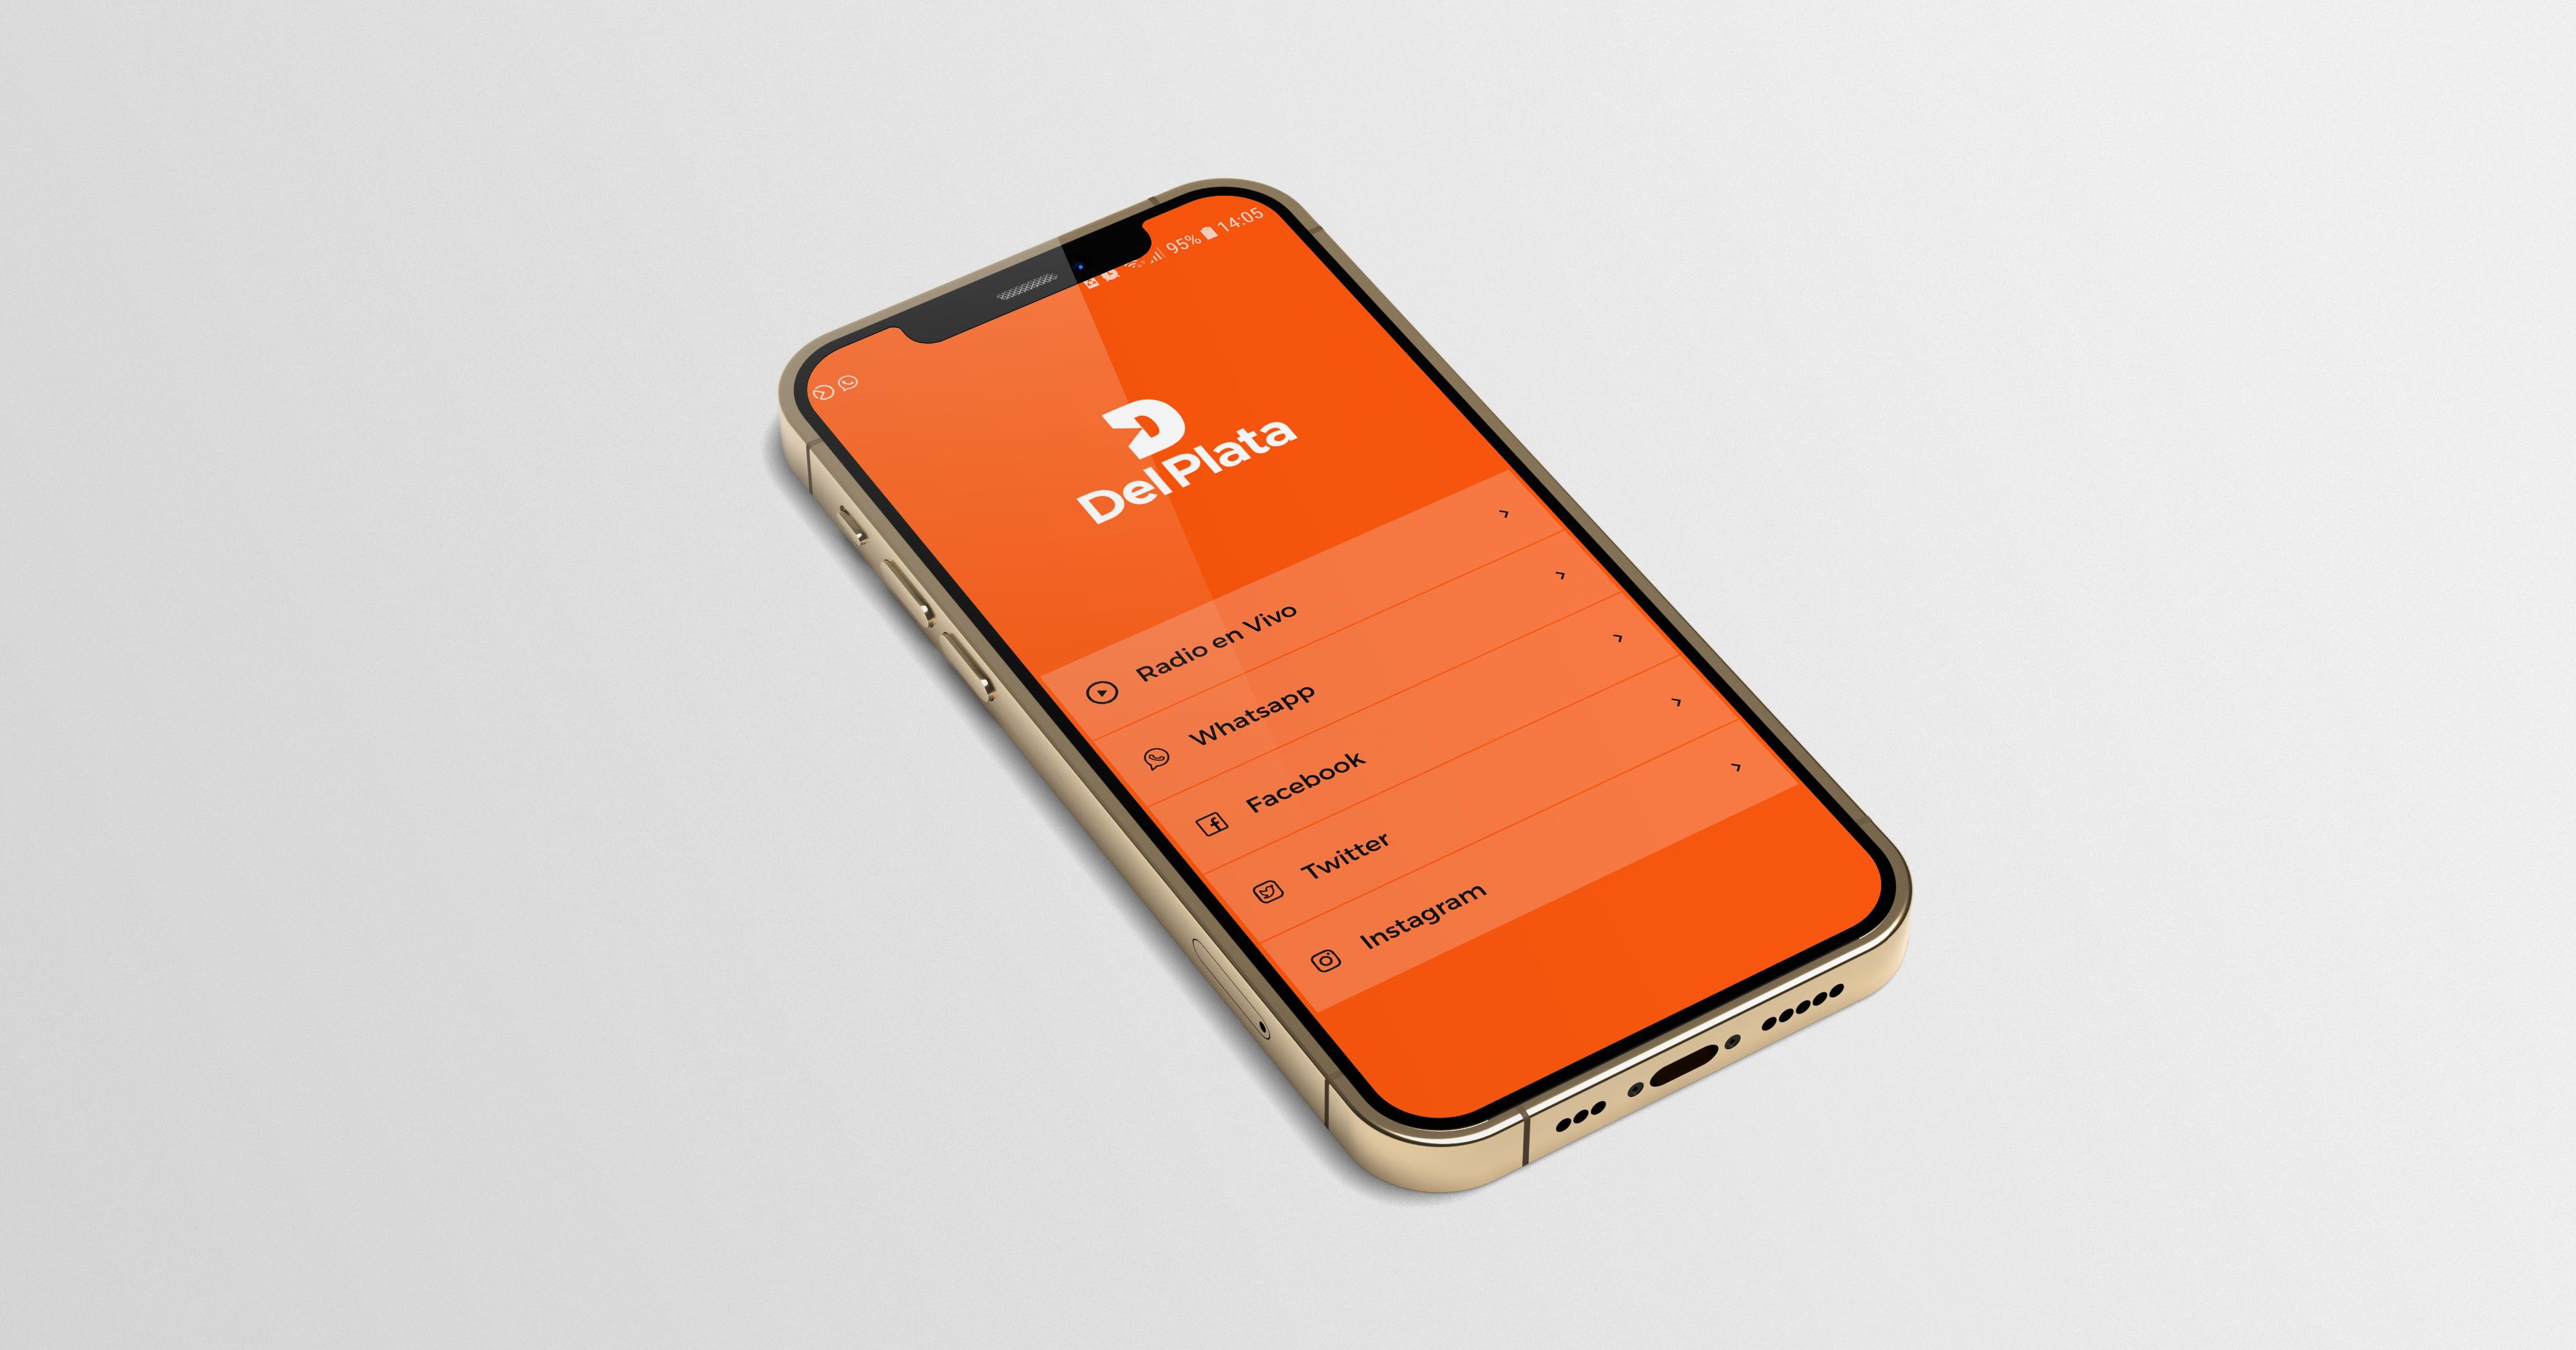 App Del Plata Celular